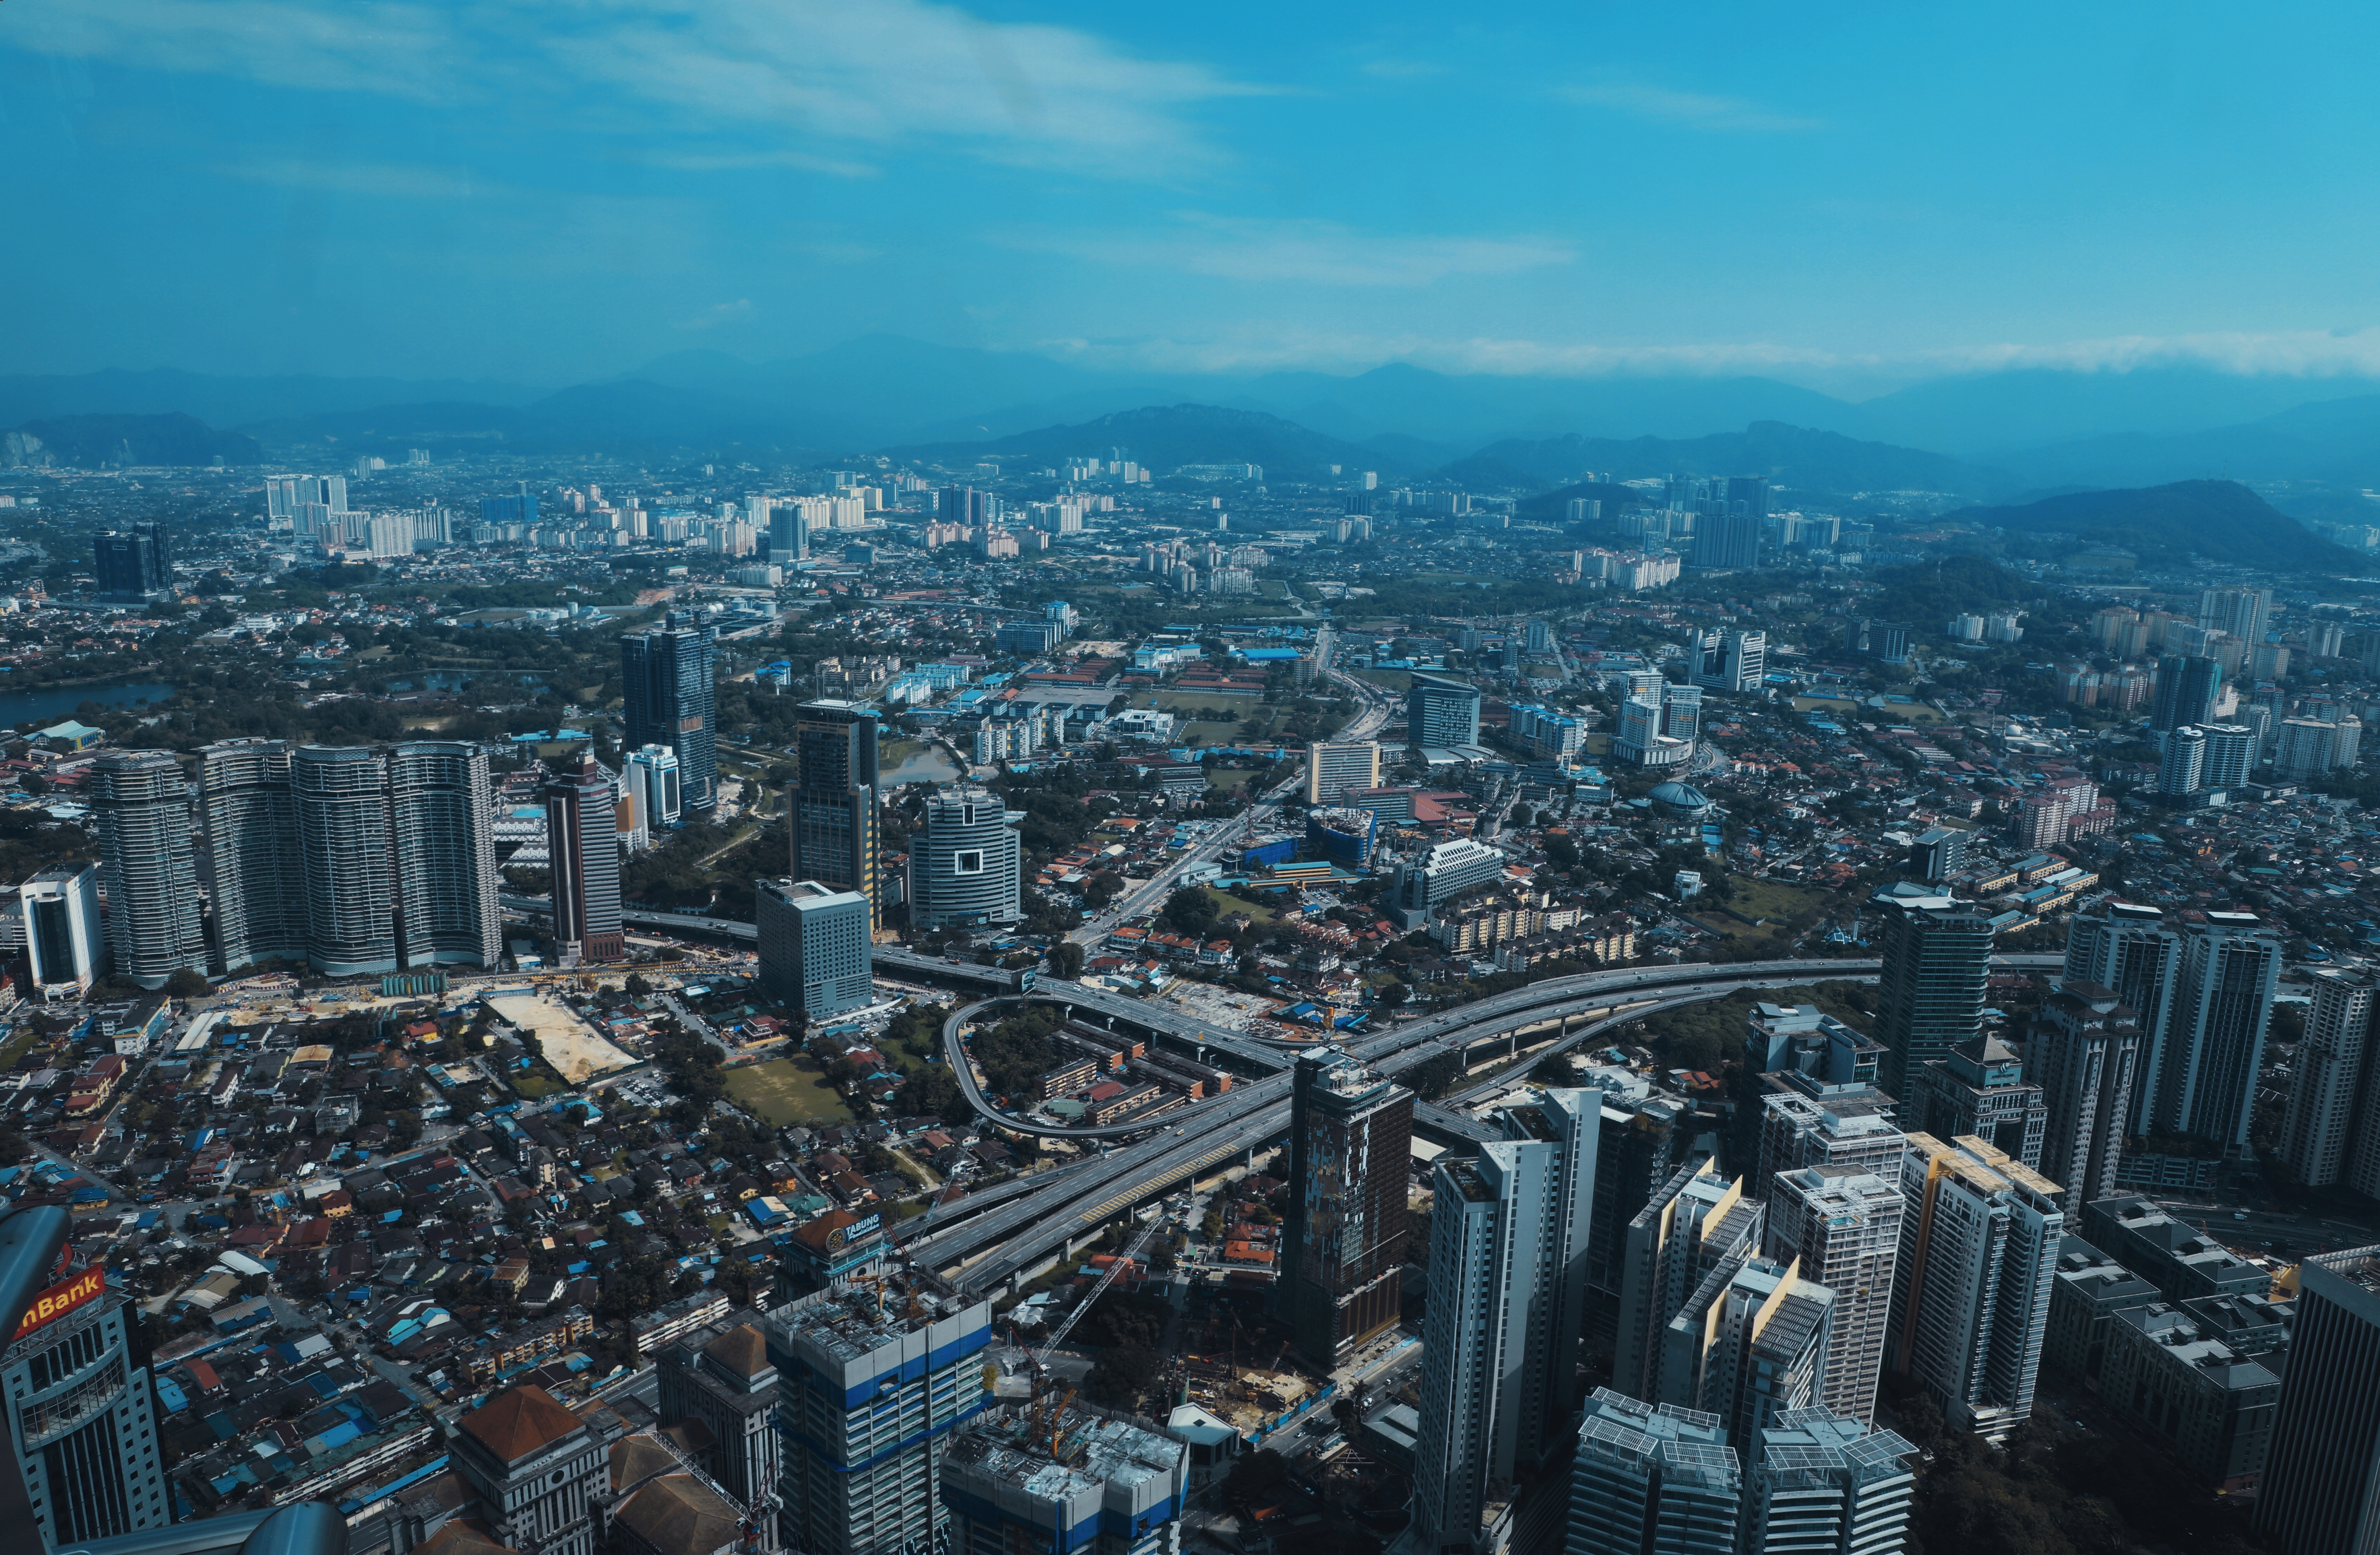 View of Kuala Lumpur, Malaysia